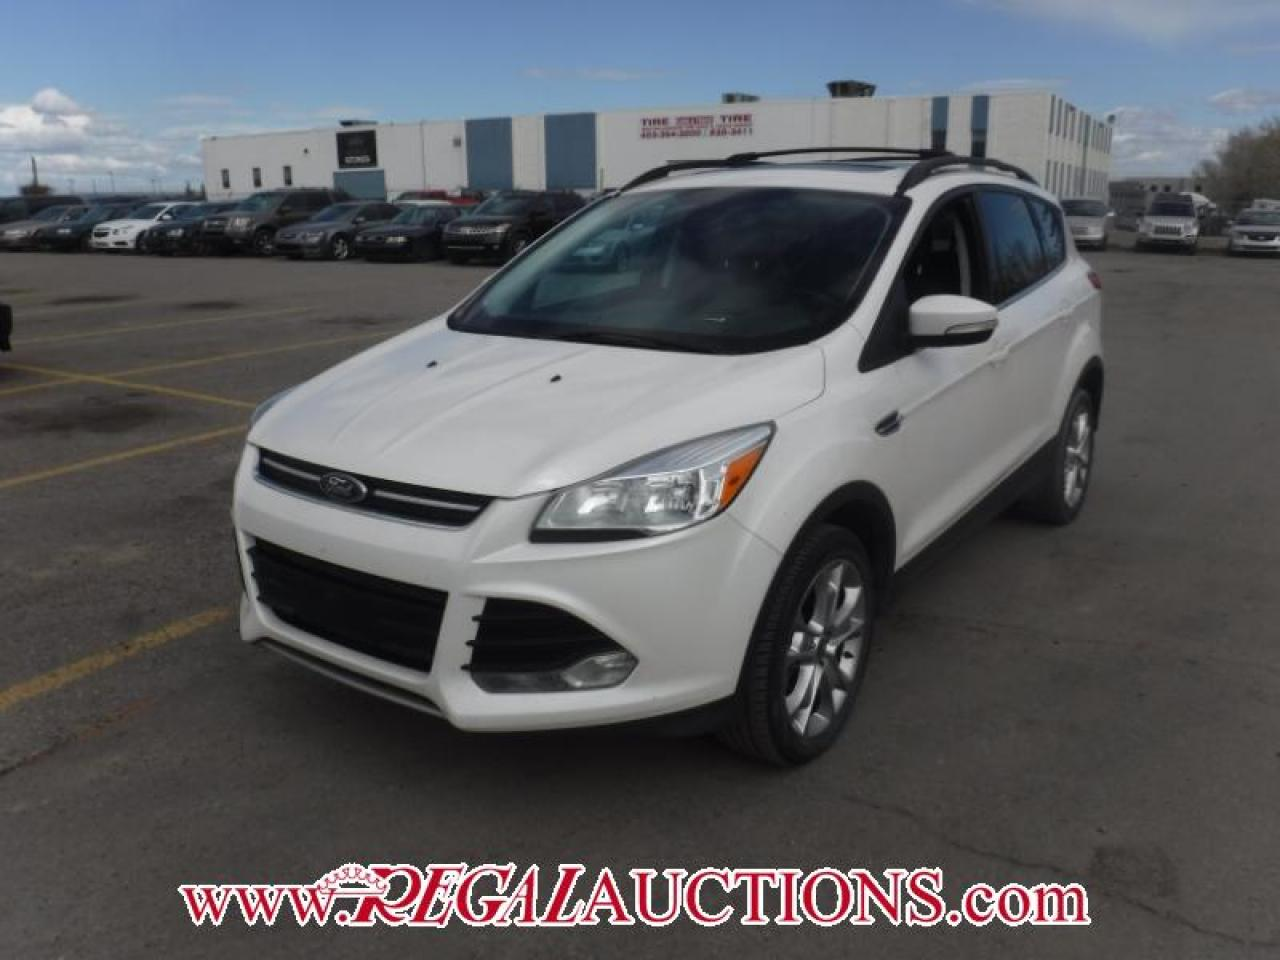 Photo of White 2013 Ford ESCAPE SEL 4D UTILITY 4WD 2.0L